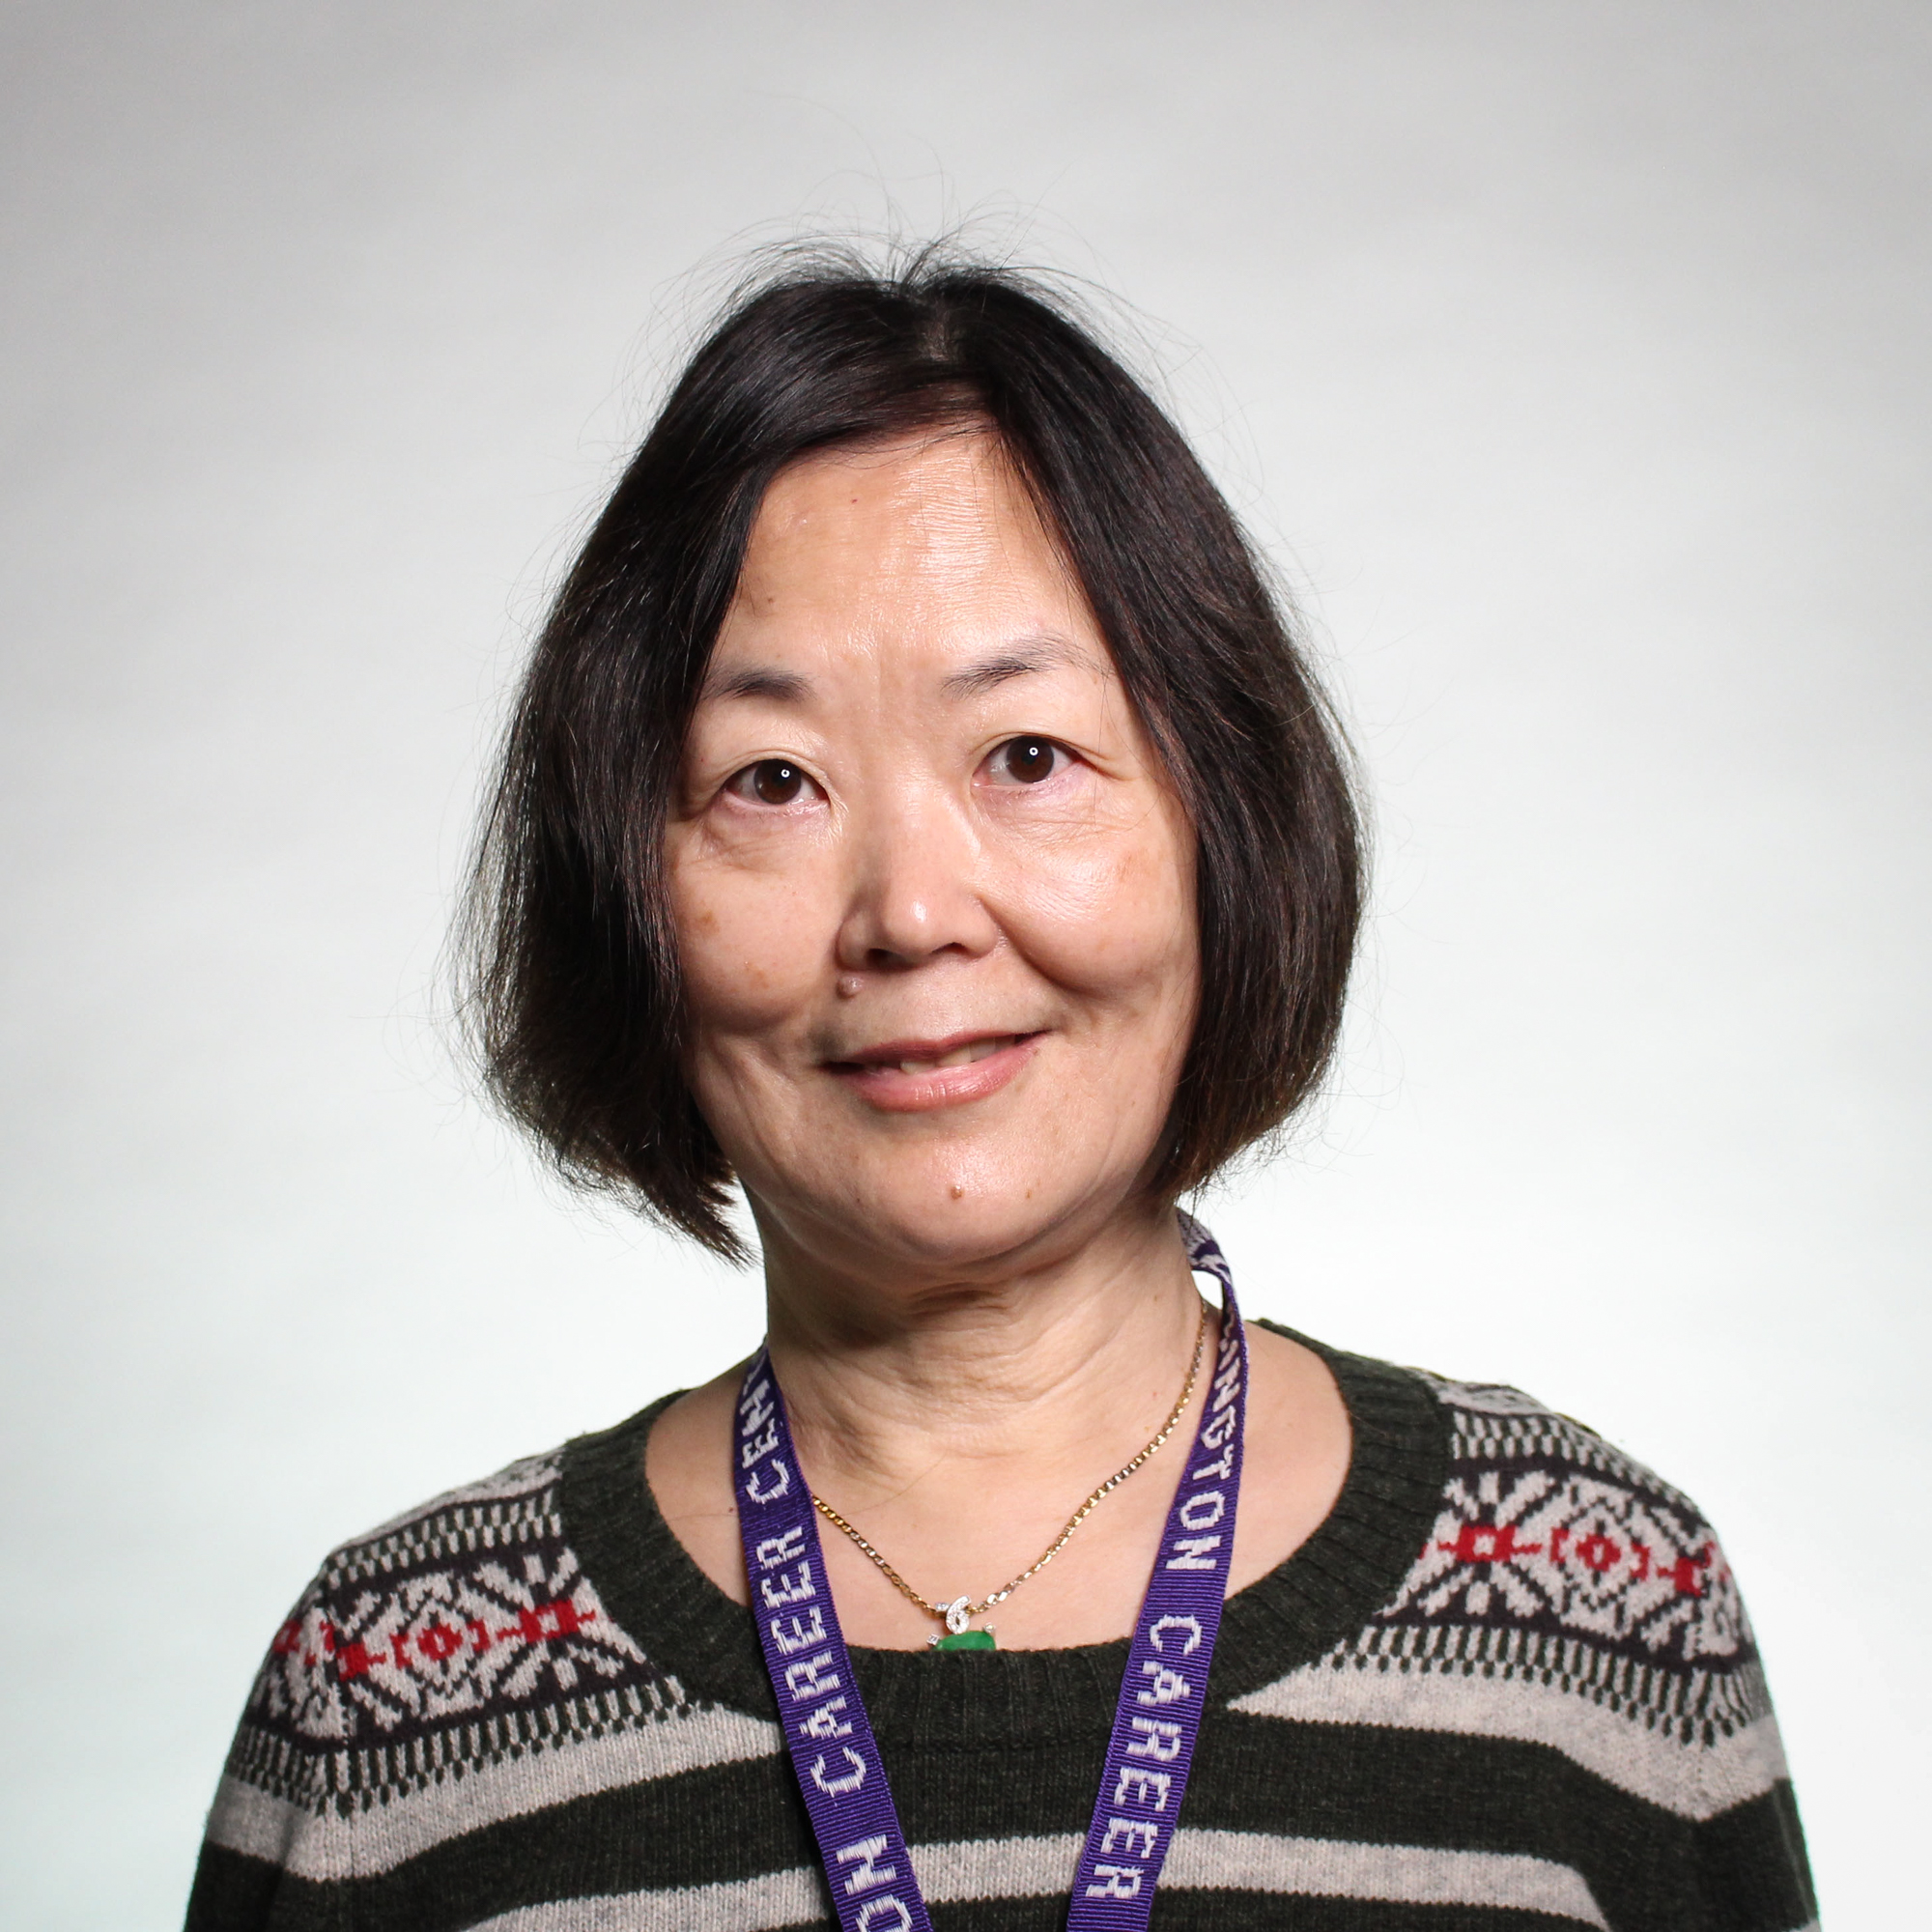 Ms. Terry Lau